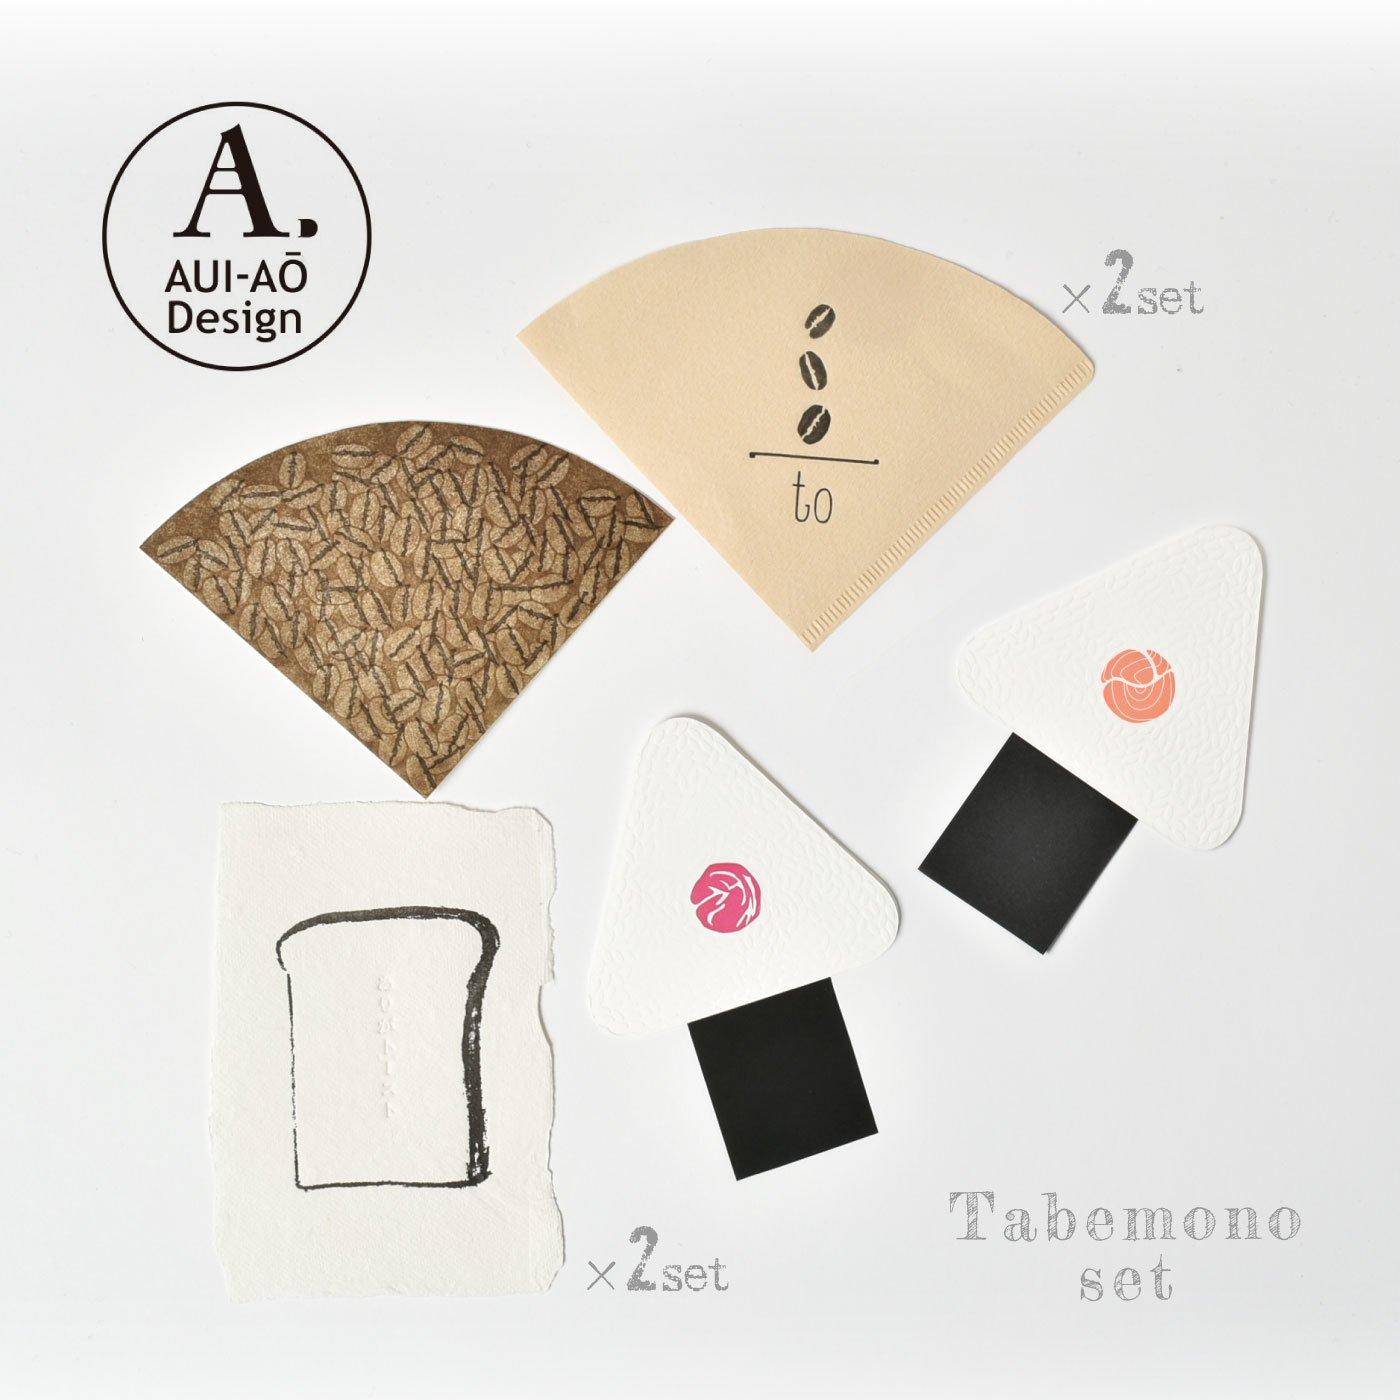 AUI-AO Design たべものセット